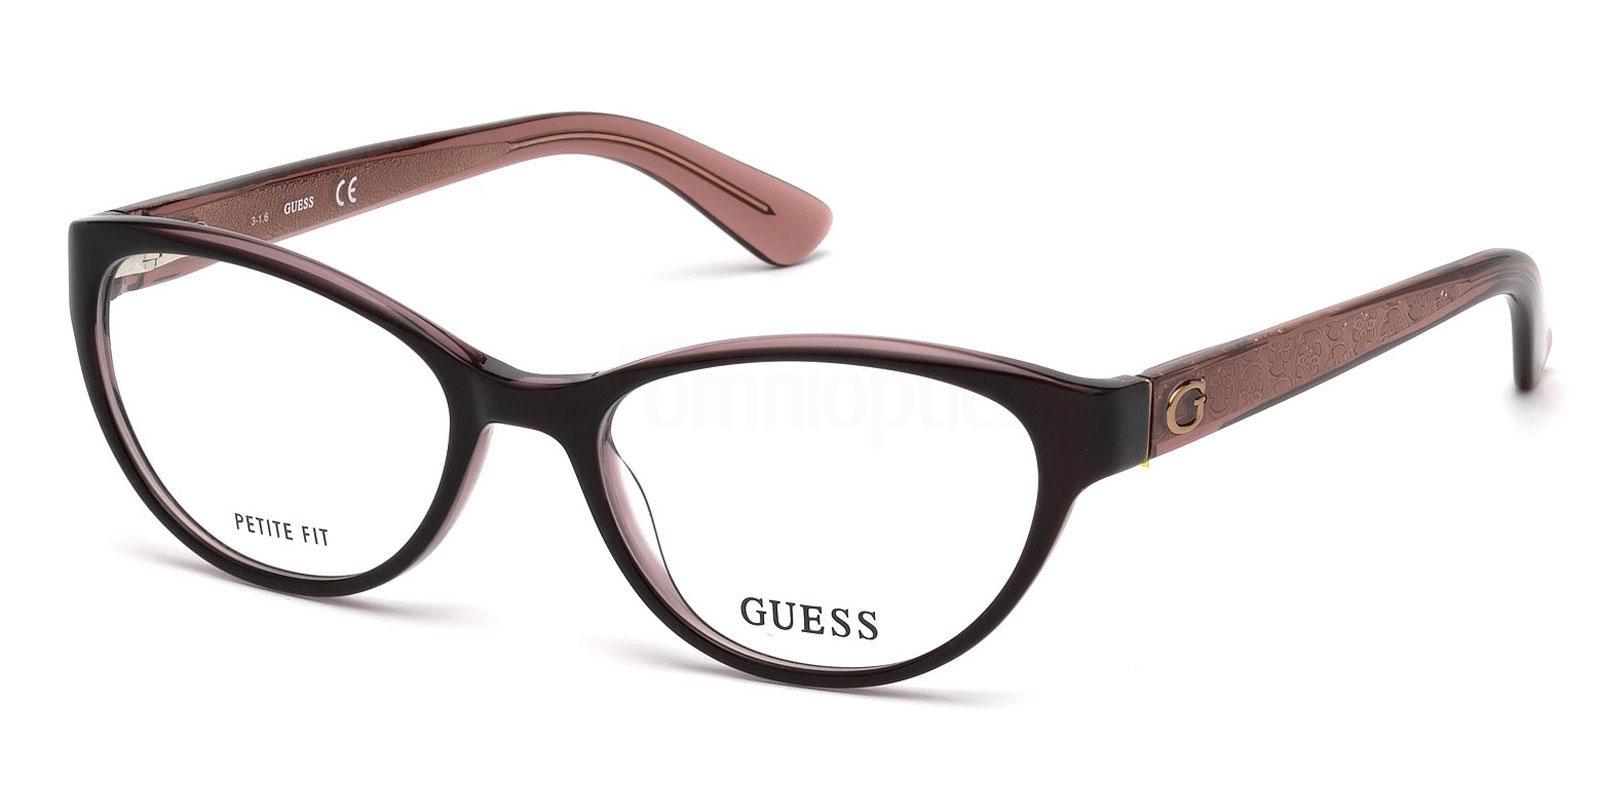 048 GU2592 , Guess